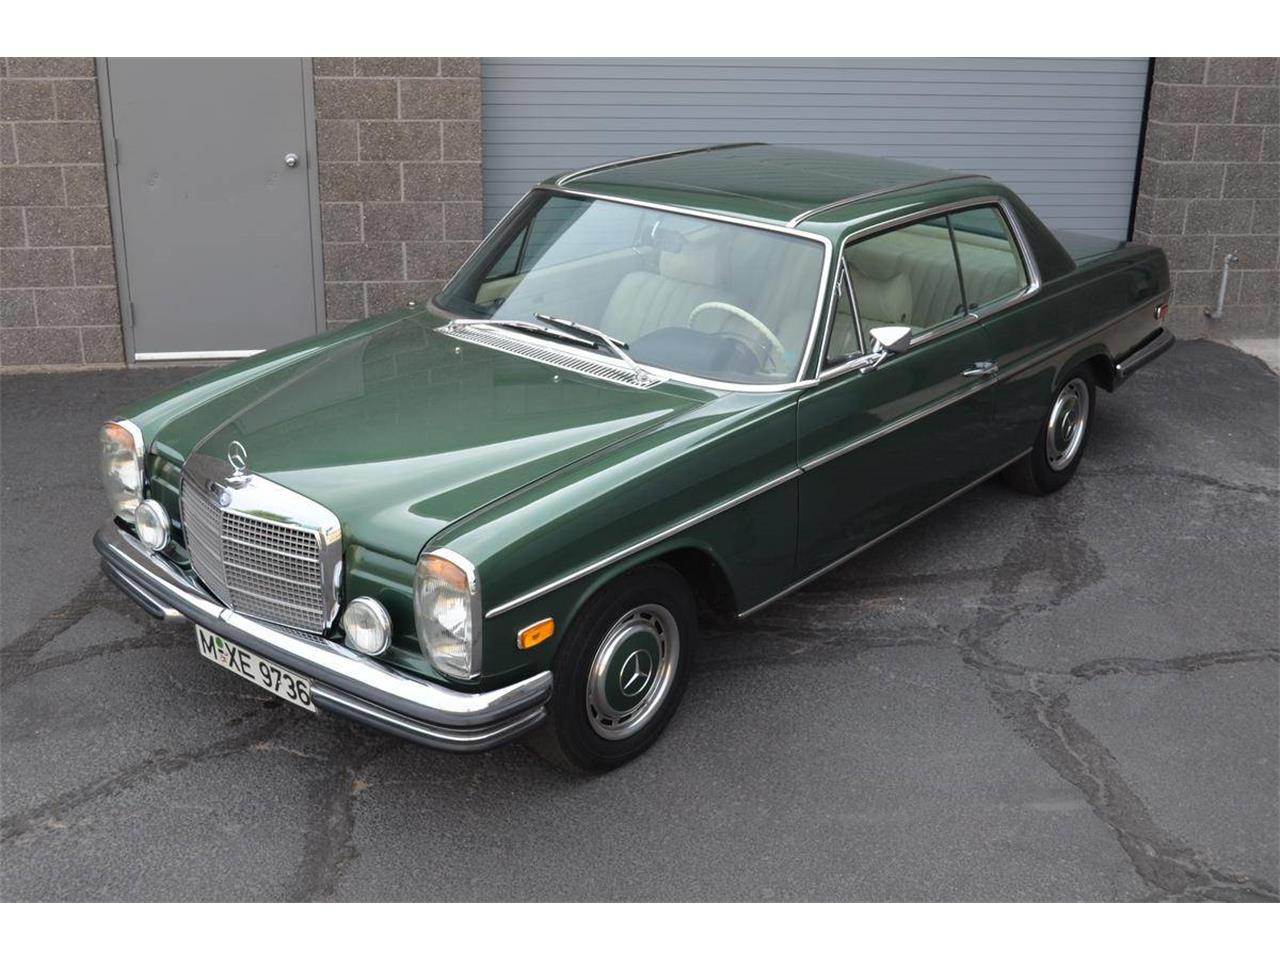 For Sale: 1969 Mercedes-Benz 250CE in Phoenix, Arizona